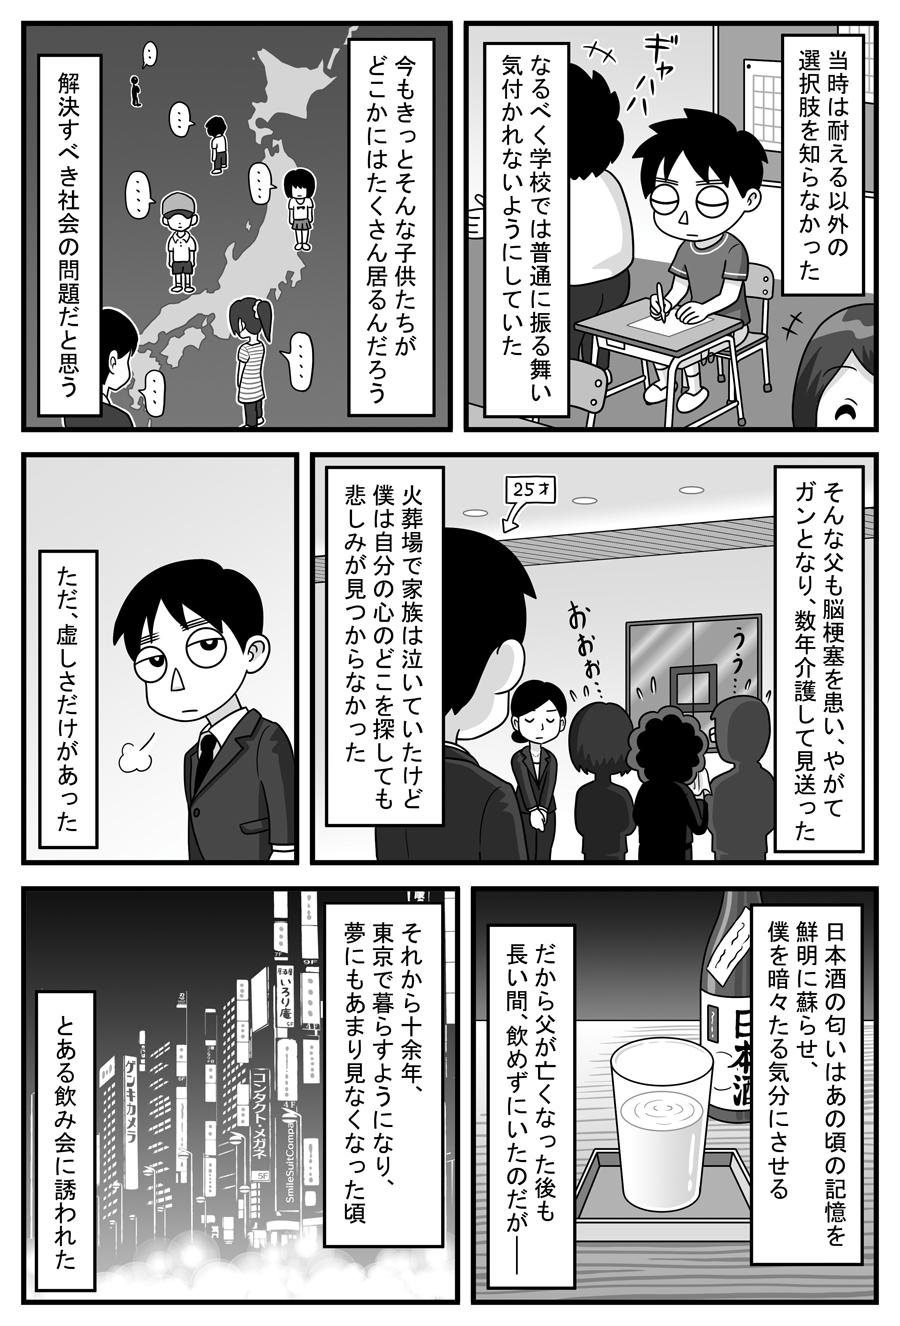 tokonokubo-b09-P04.jpg